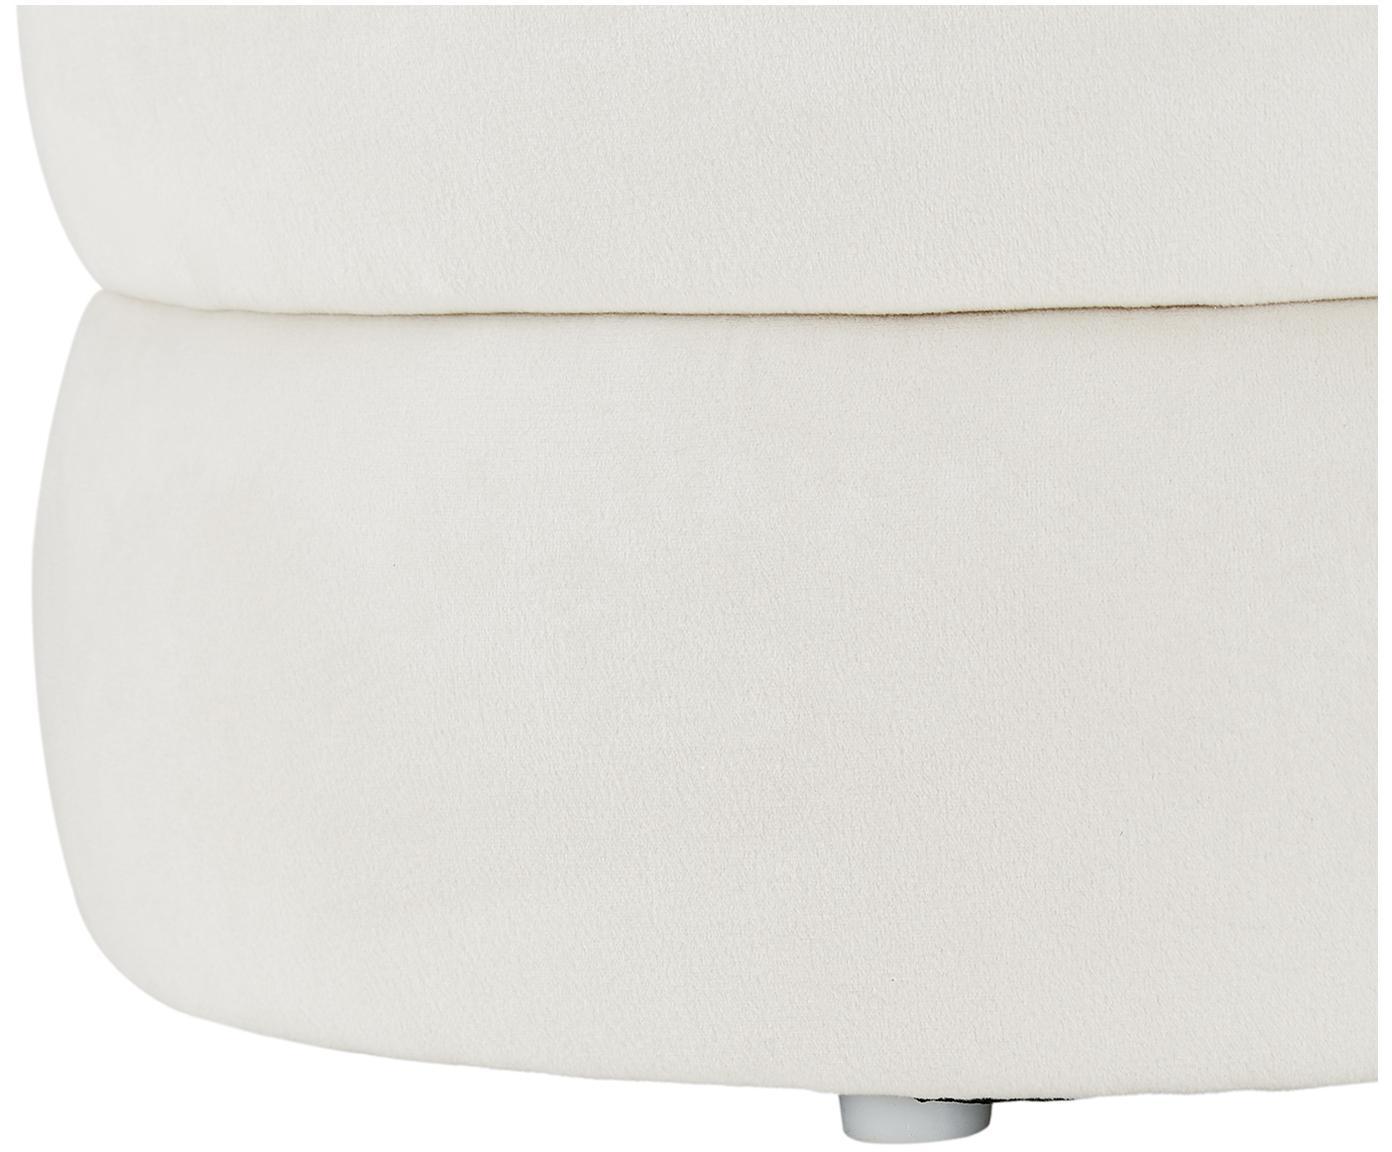 Fluwelen bank Alto, Bekleding: fluweel (polyester), Frame: massief grenenhout, multi, Crèmewit, 110 x 48 cm